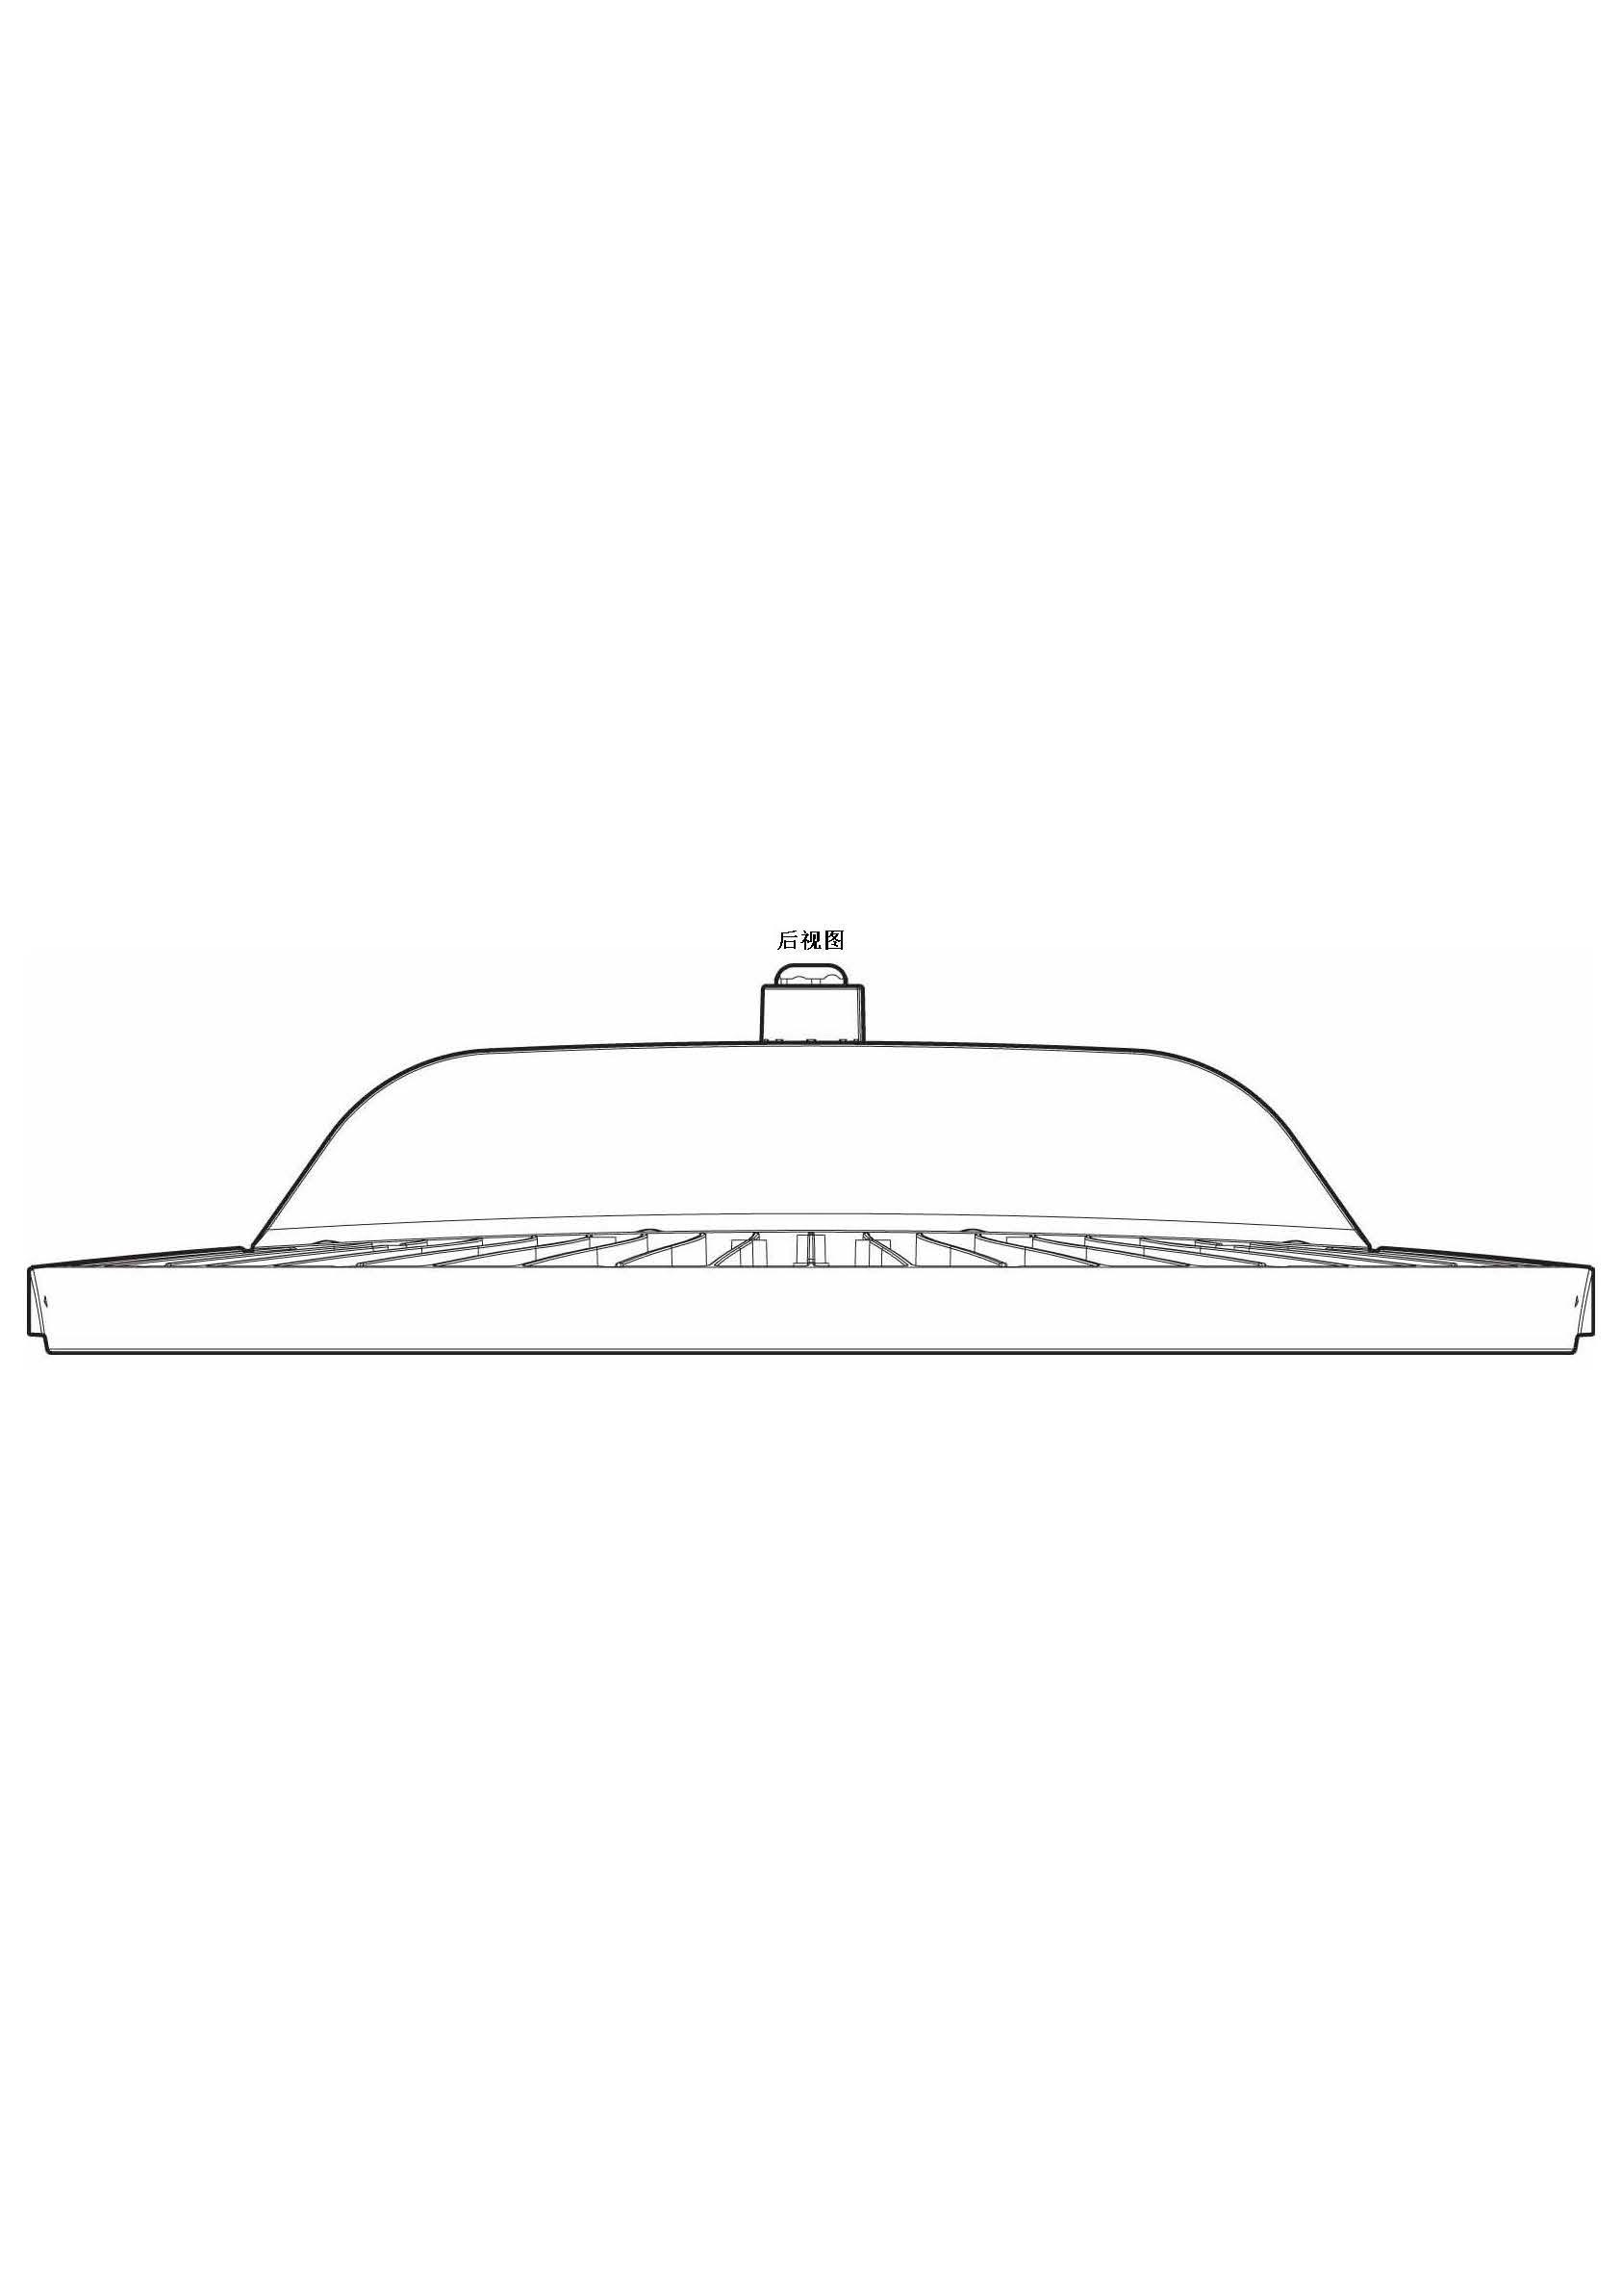 CN201630209928-LED高天棚燈-外觀專利_頁面_4.jpg